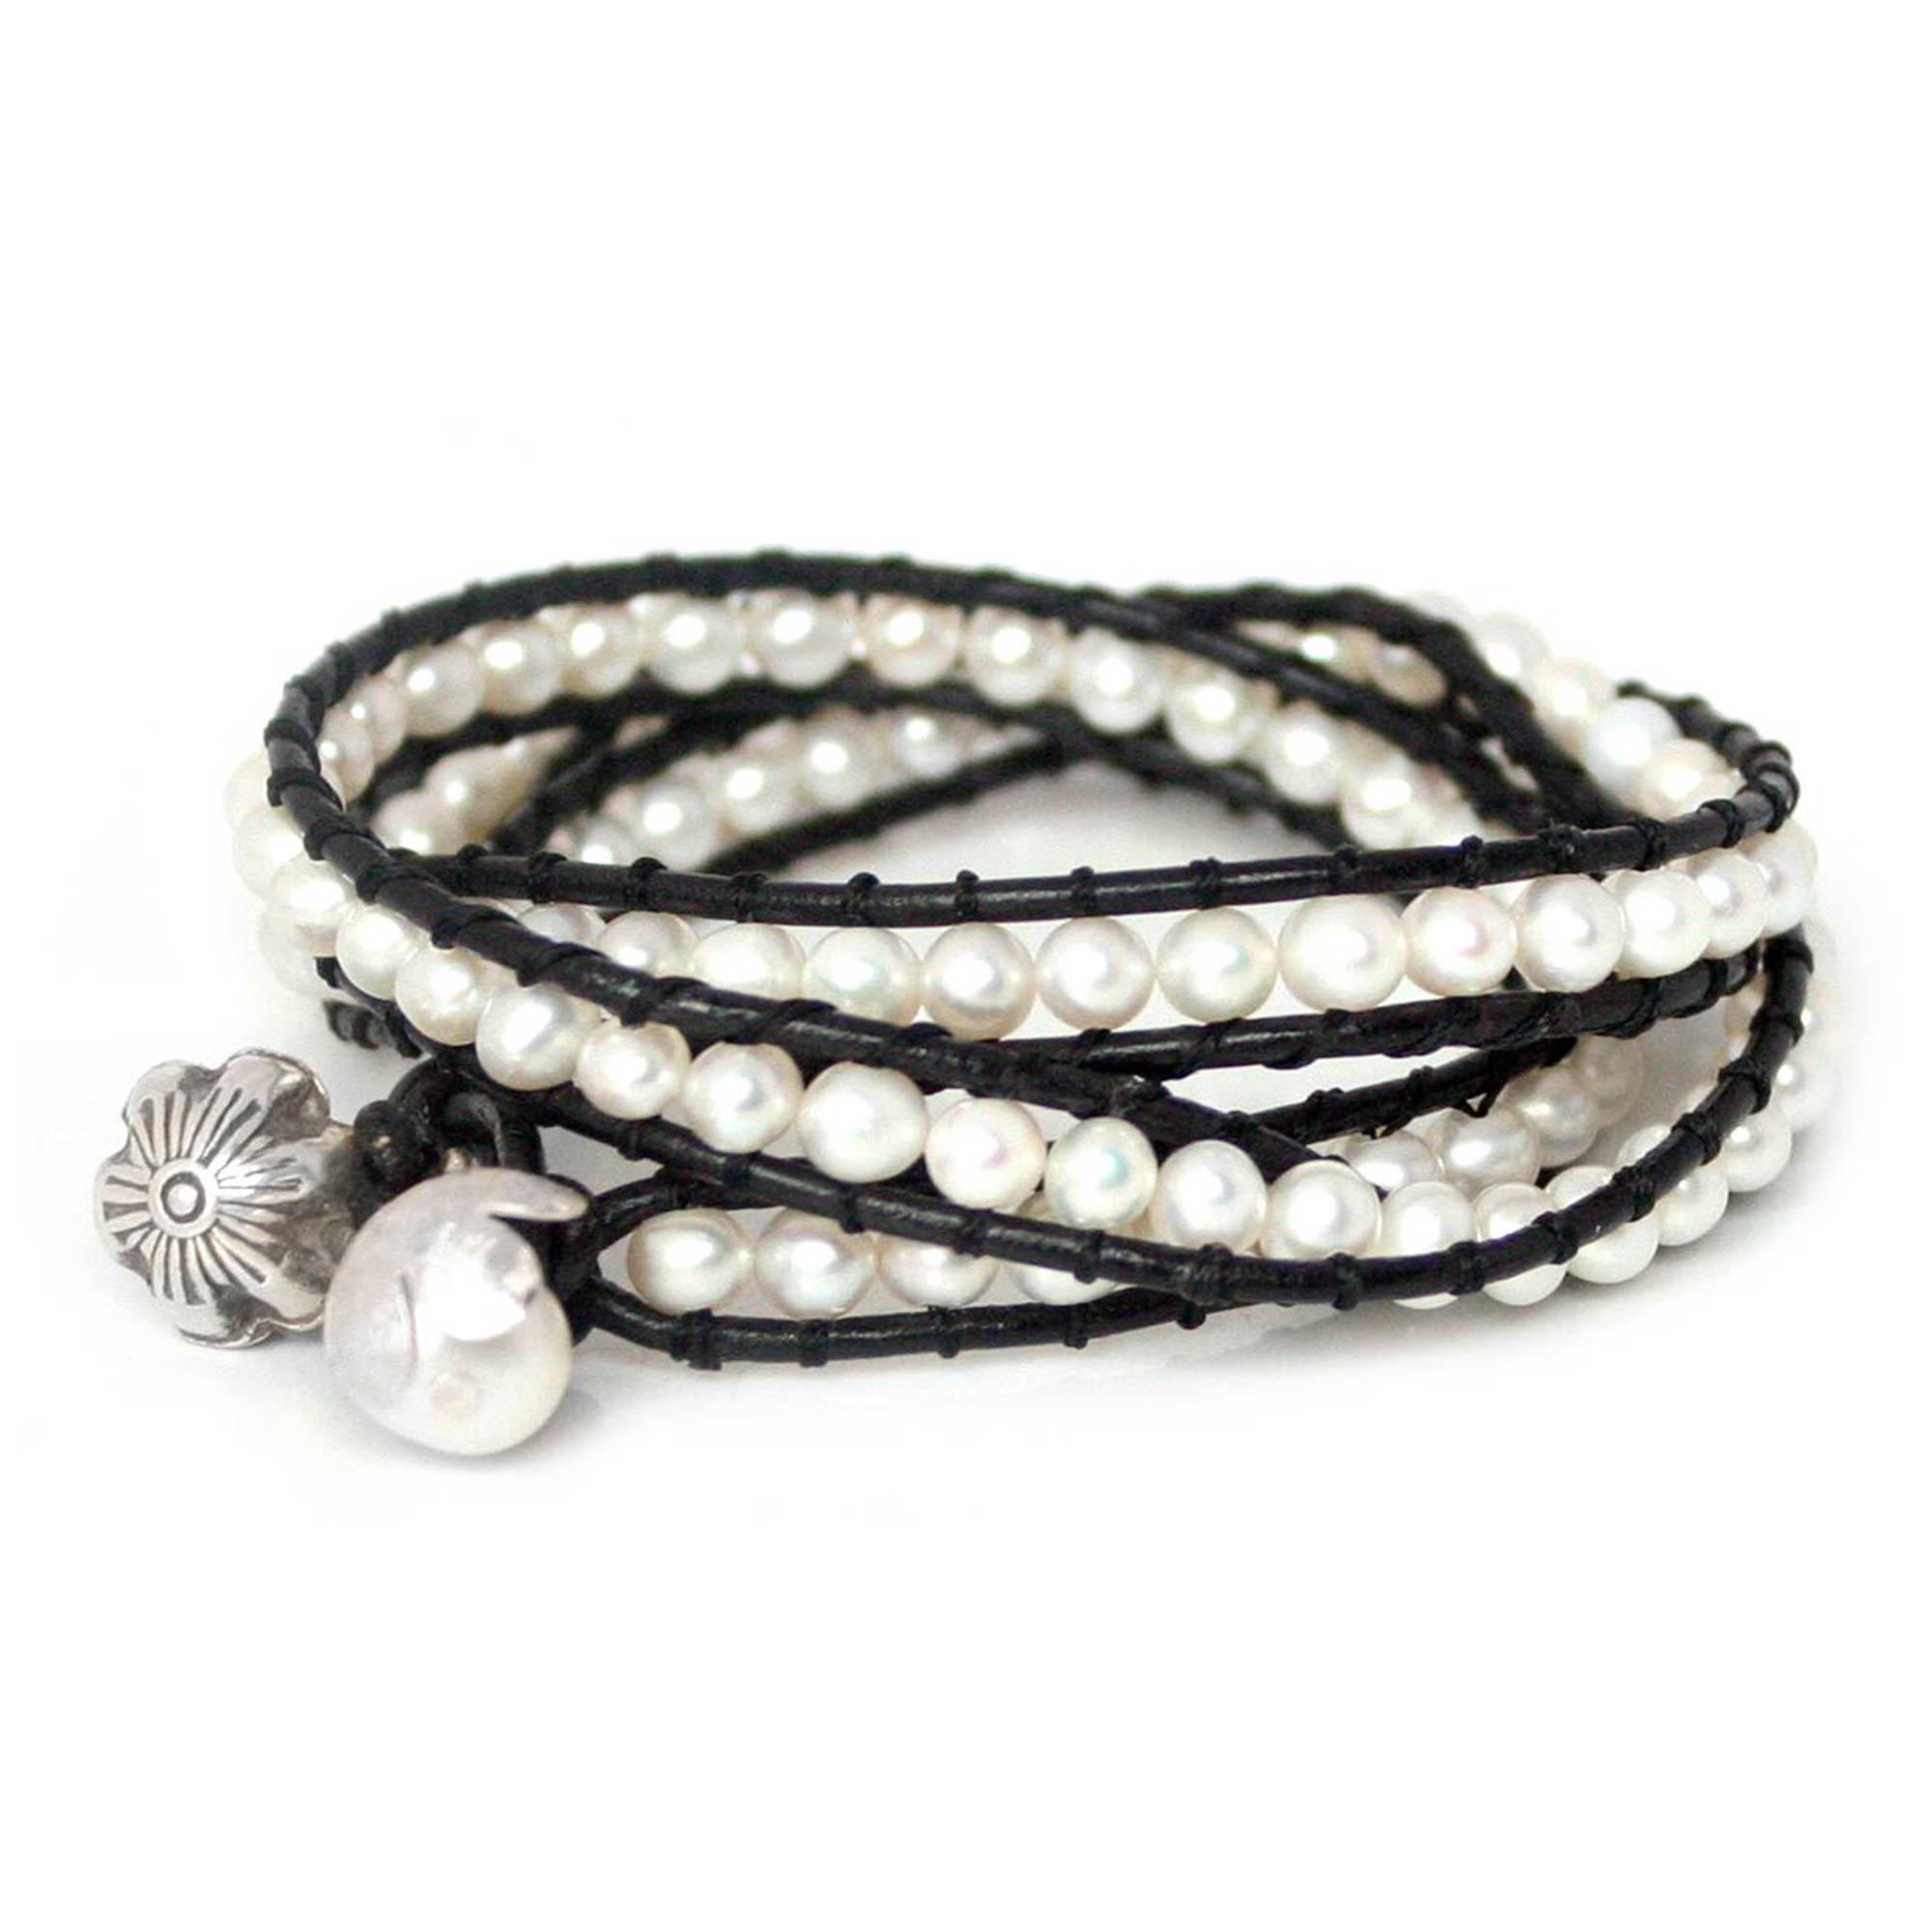 Calibre Lancer Black Dial Chronograph Men's Watch SC-5L2 Black leather pearl wrap around fashion bracelet